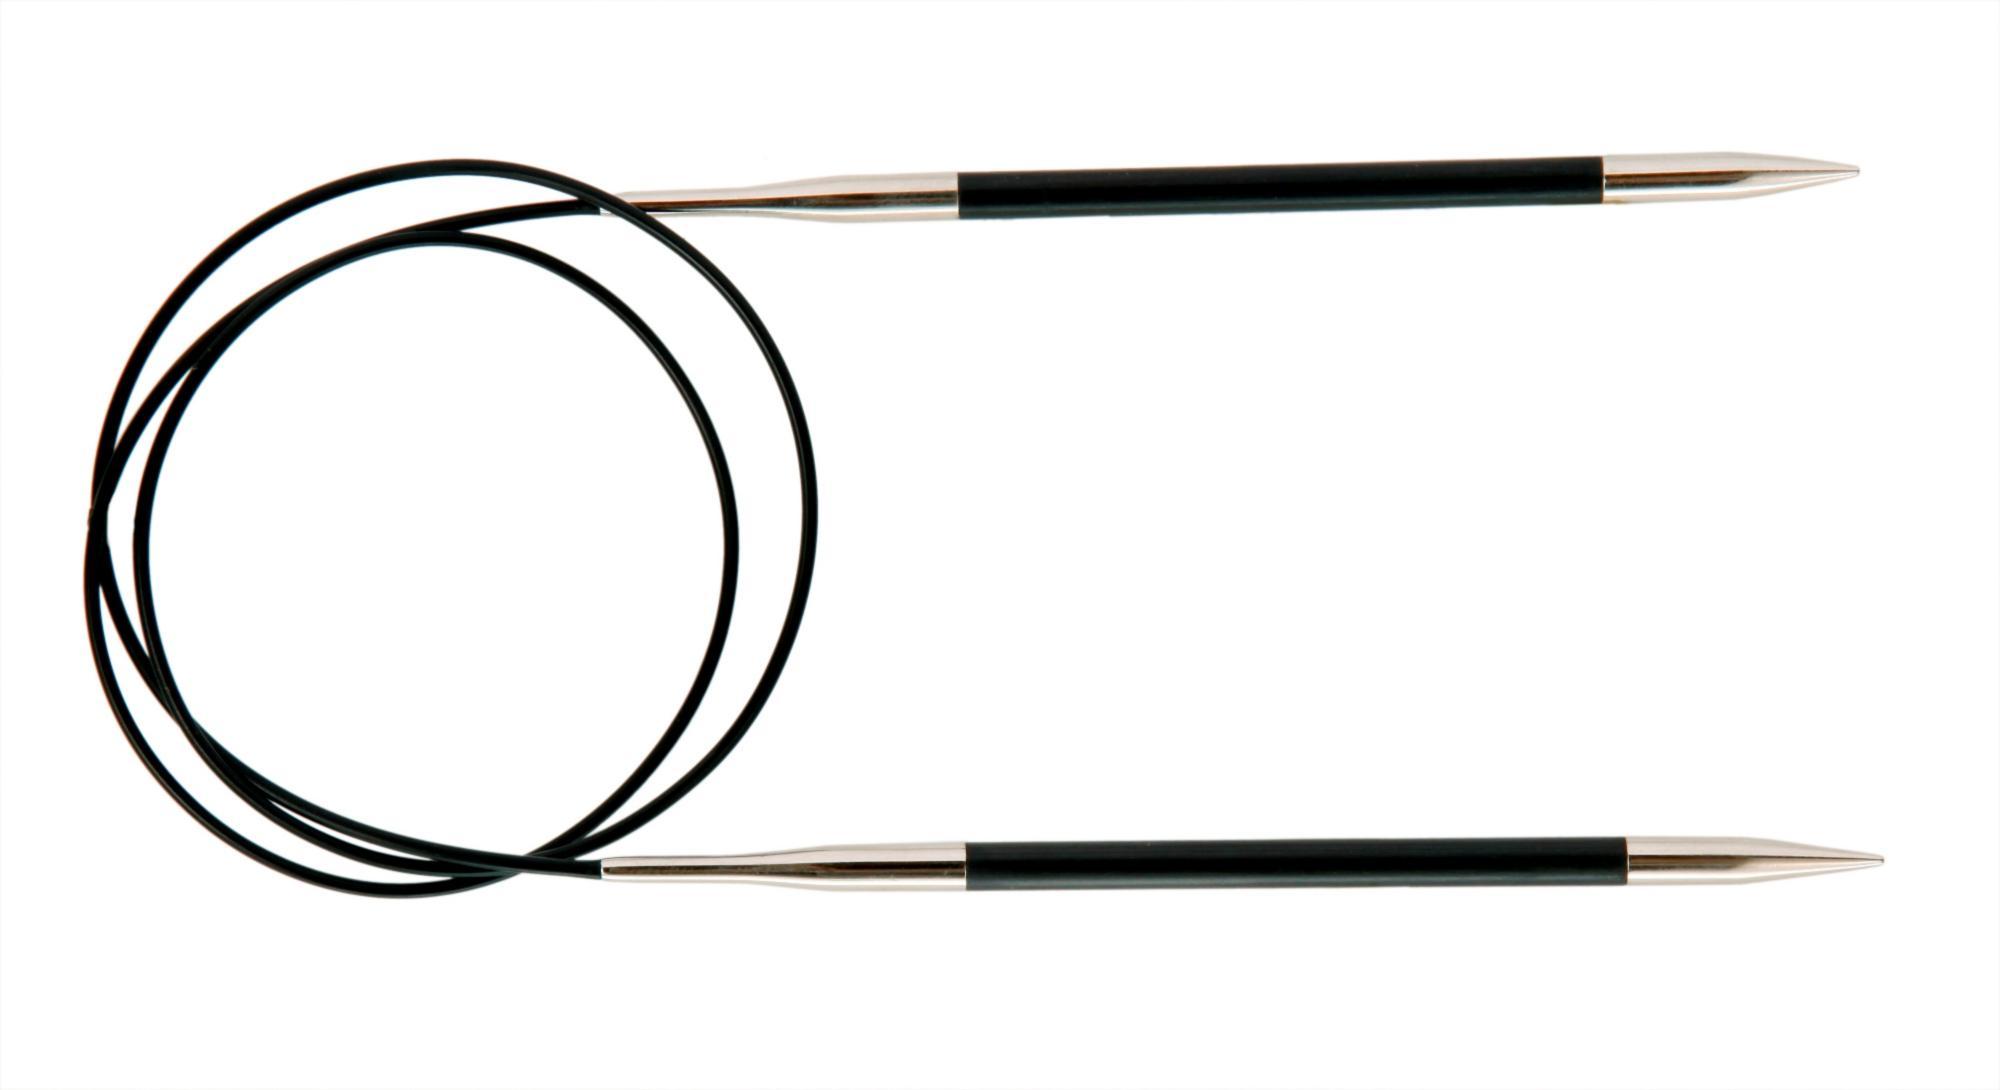 Спицы круговые 80 см Karbonz KnitPro, 41191, 5.50 мм